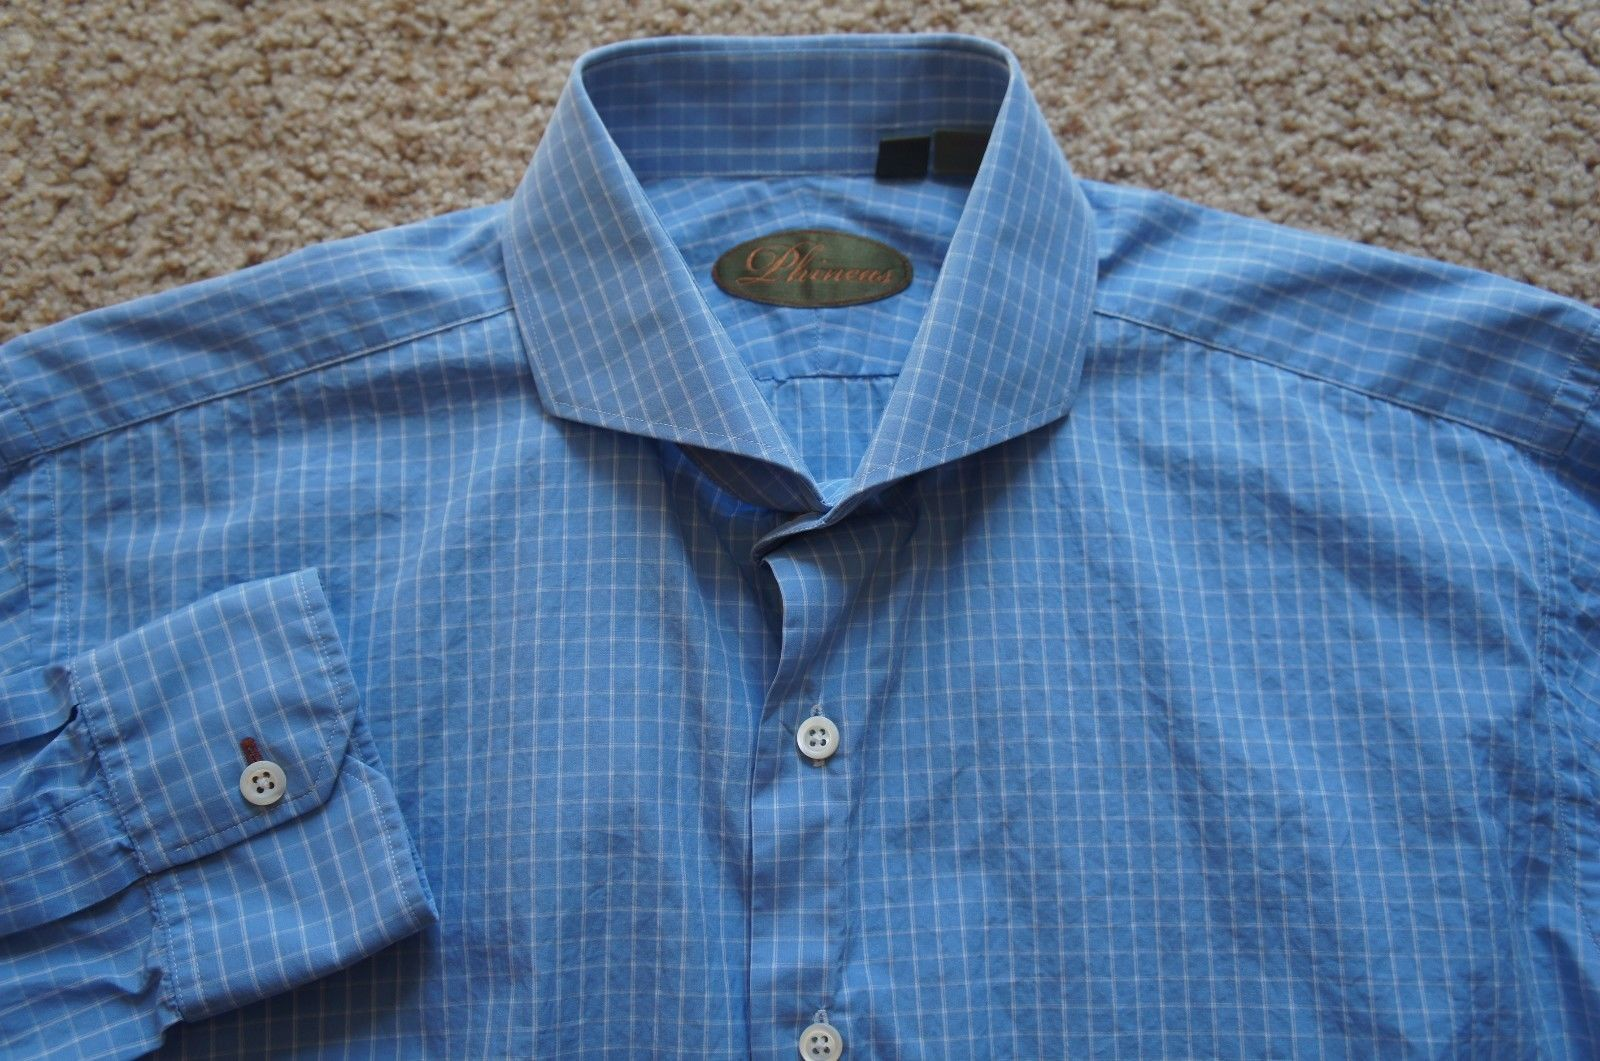 Tom Ford NWT $660 Solid Blue Slim Fit 100/% Cotton Dress Shirt 16 US 41 IT